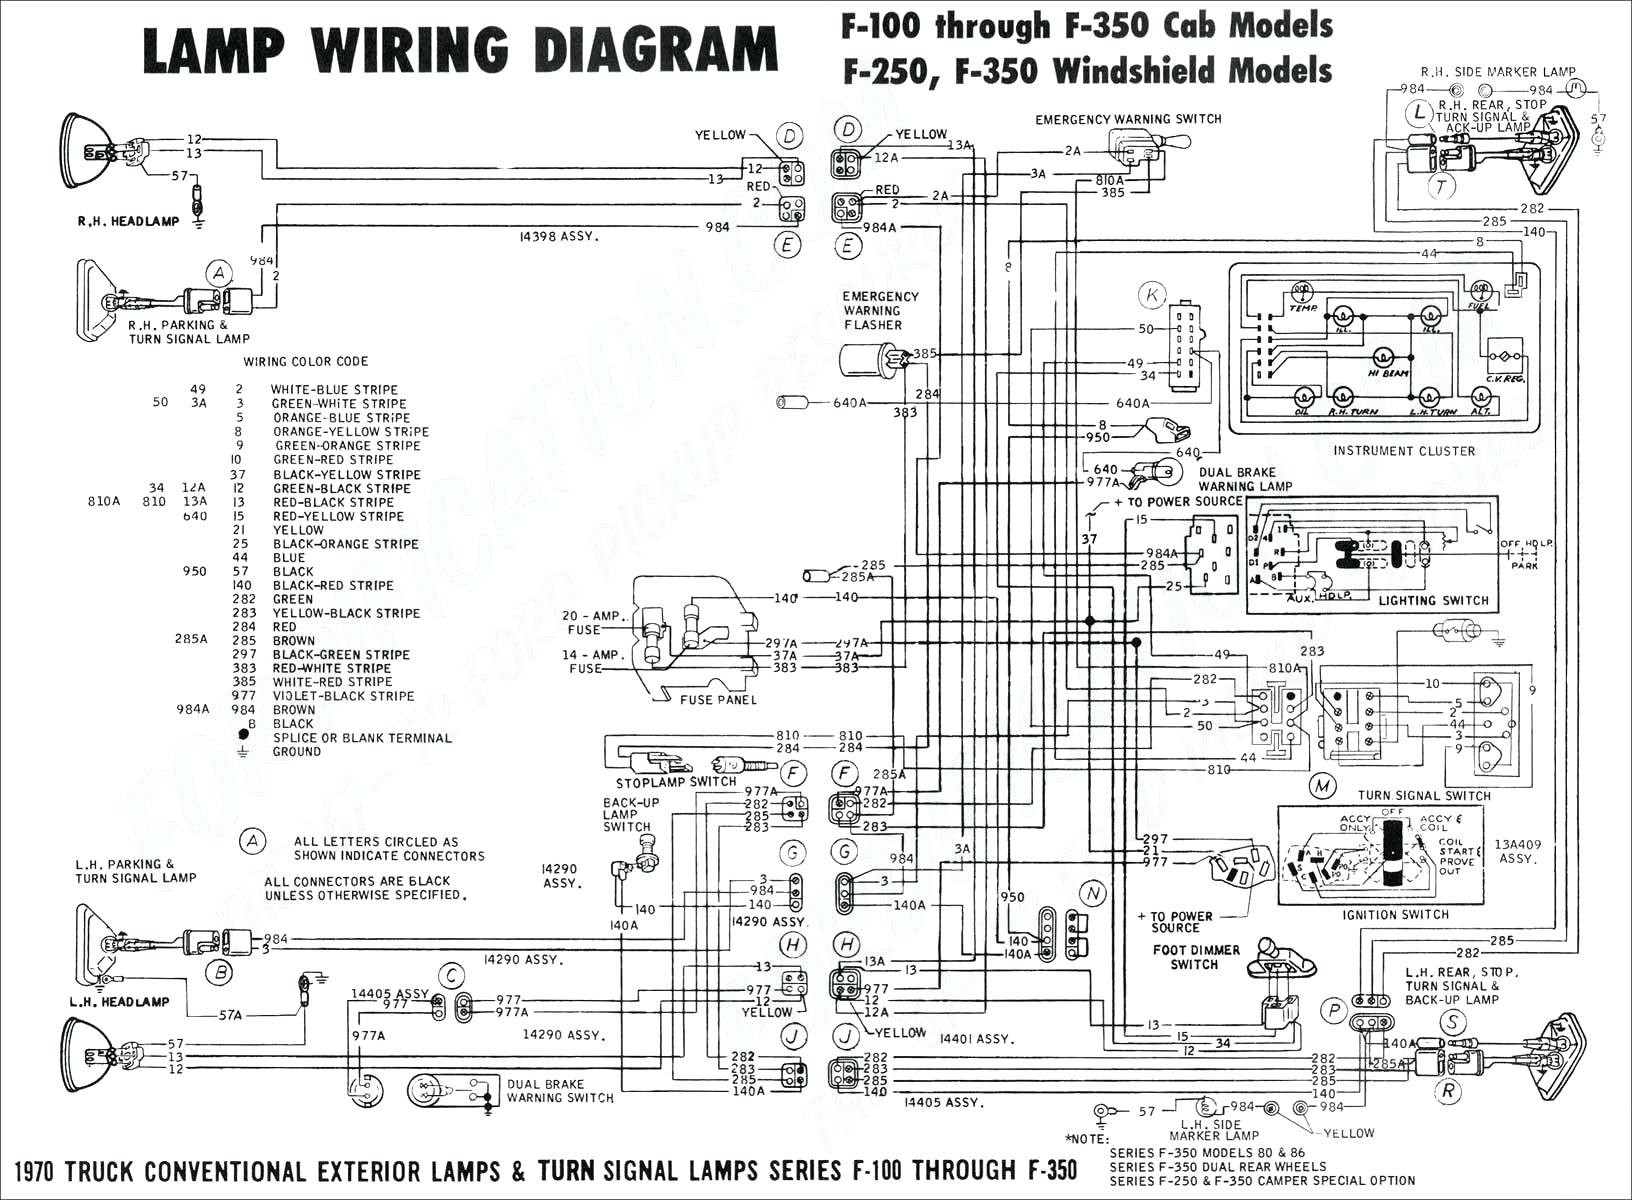 Cat 5 Wiring Diagram Free Picture Schematic Schematics Internet Mack Ac Tech Tips